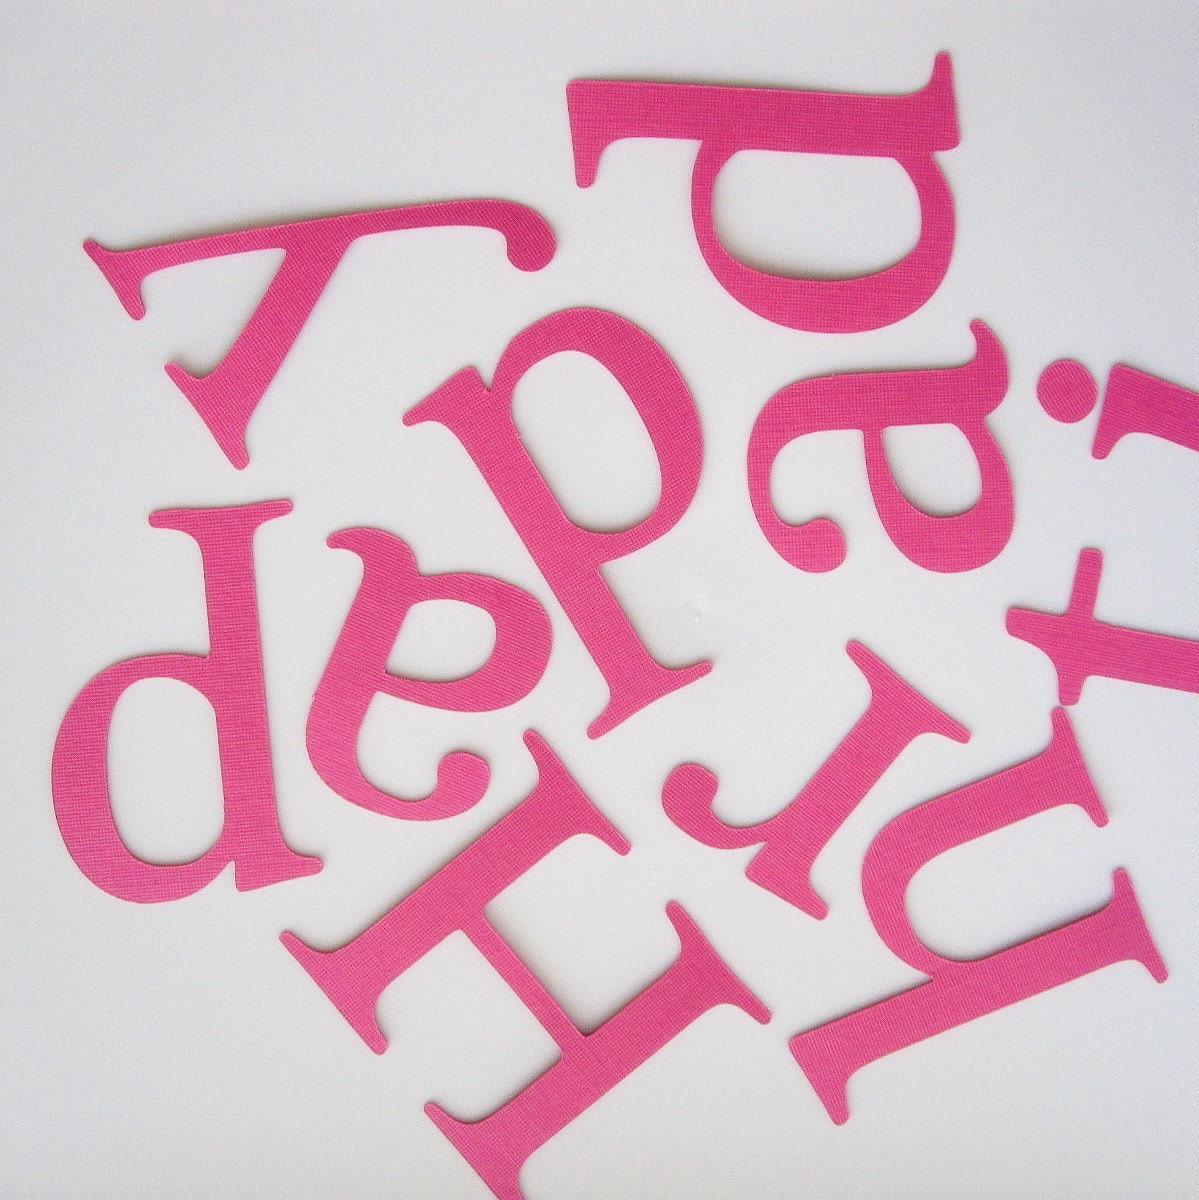 die cut letters happy birthday die cut letters for banner With die cut letters